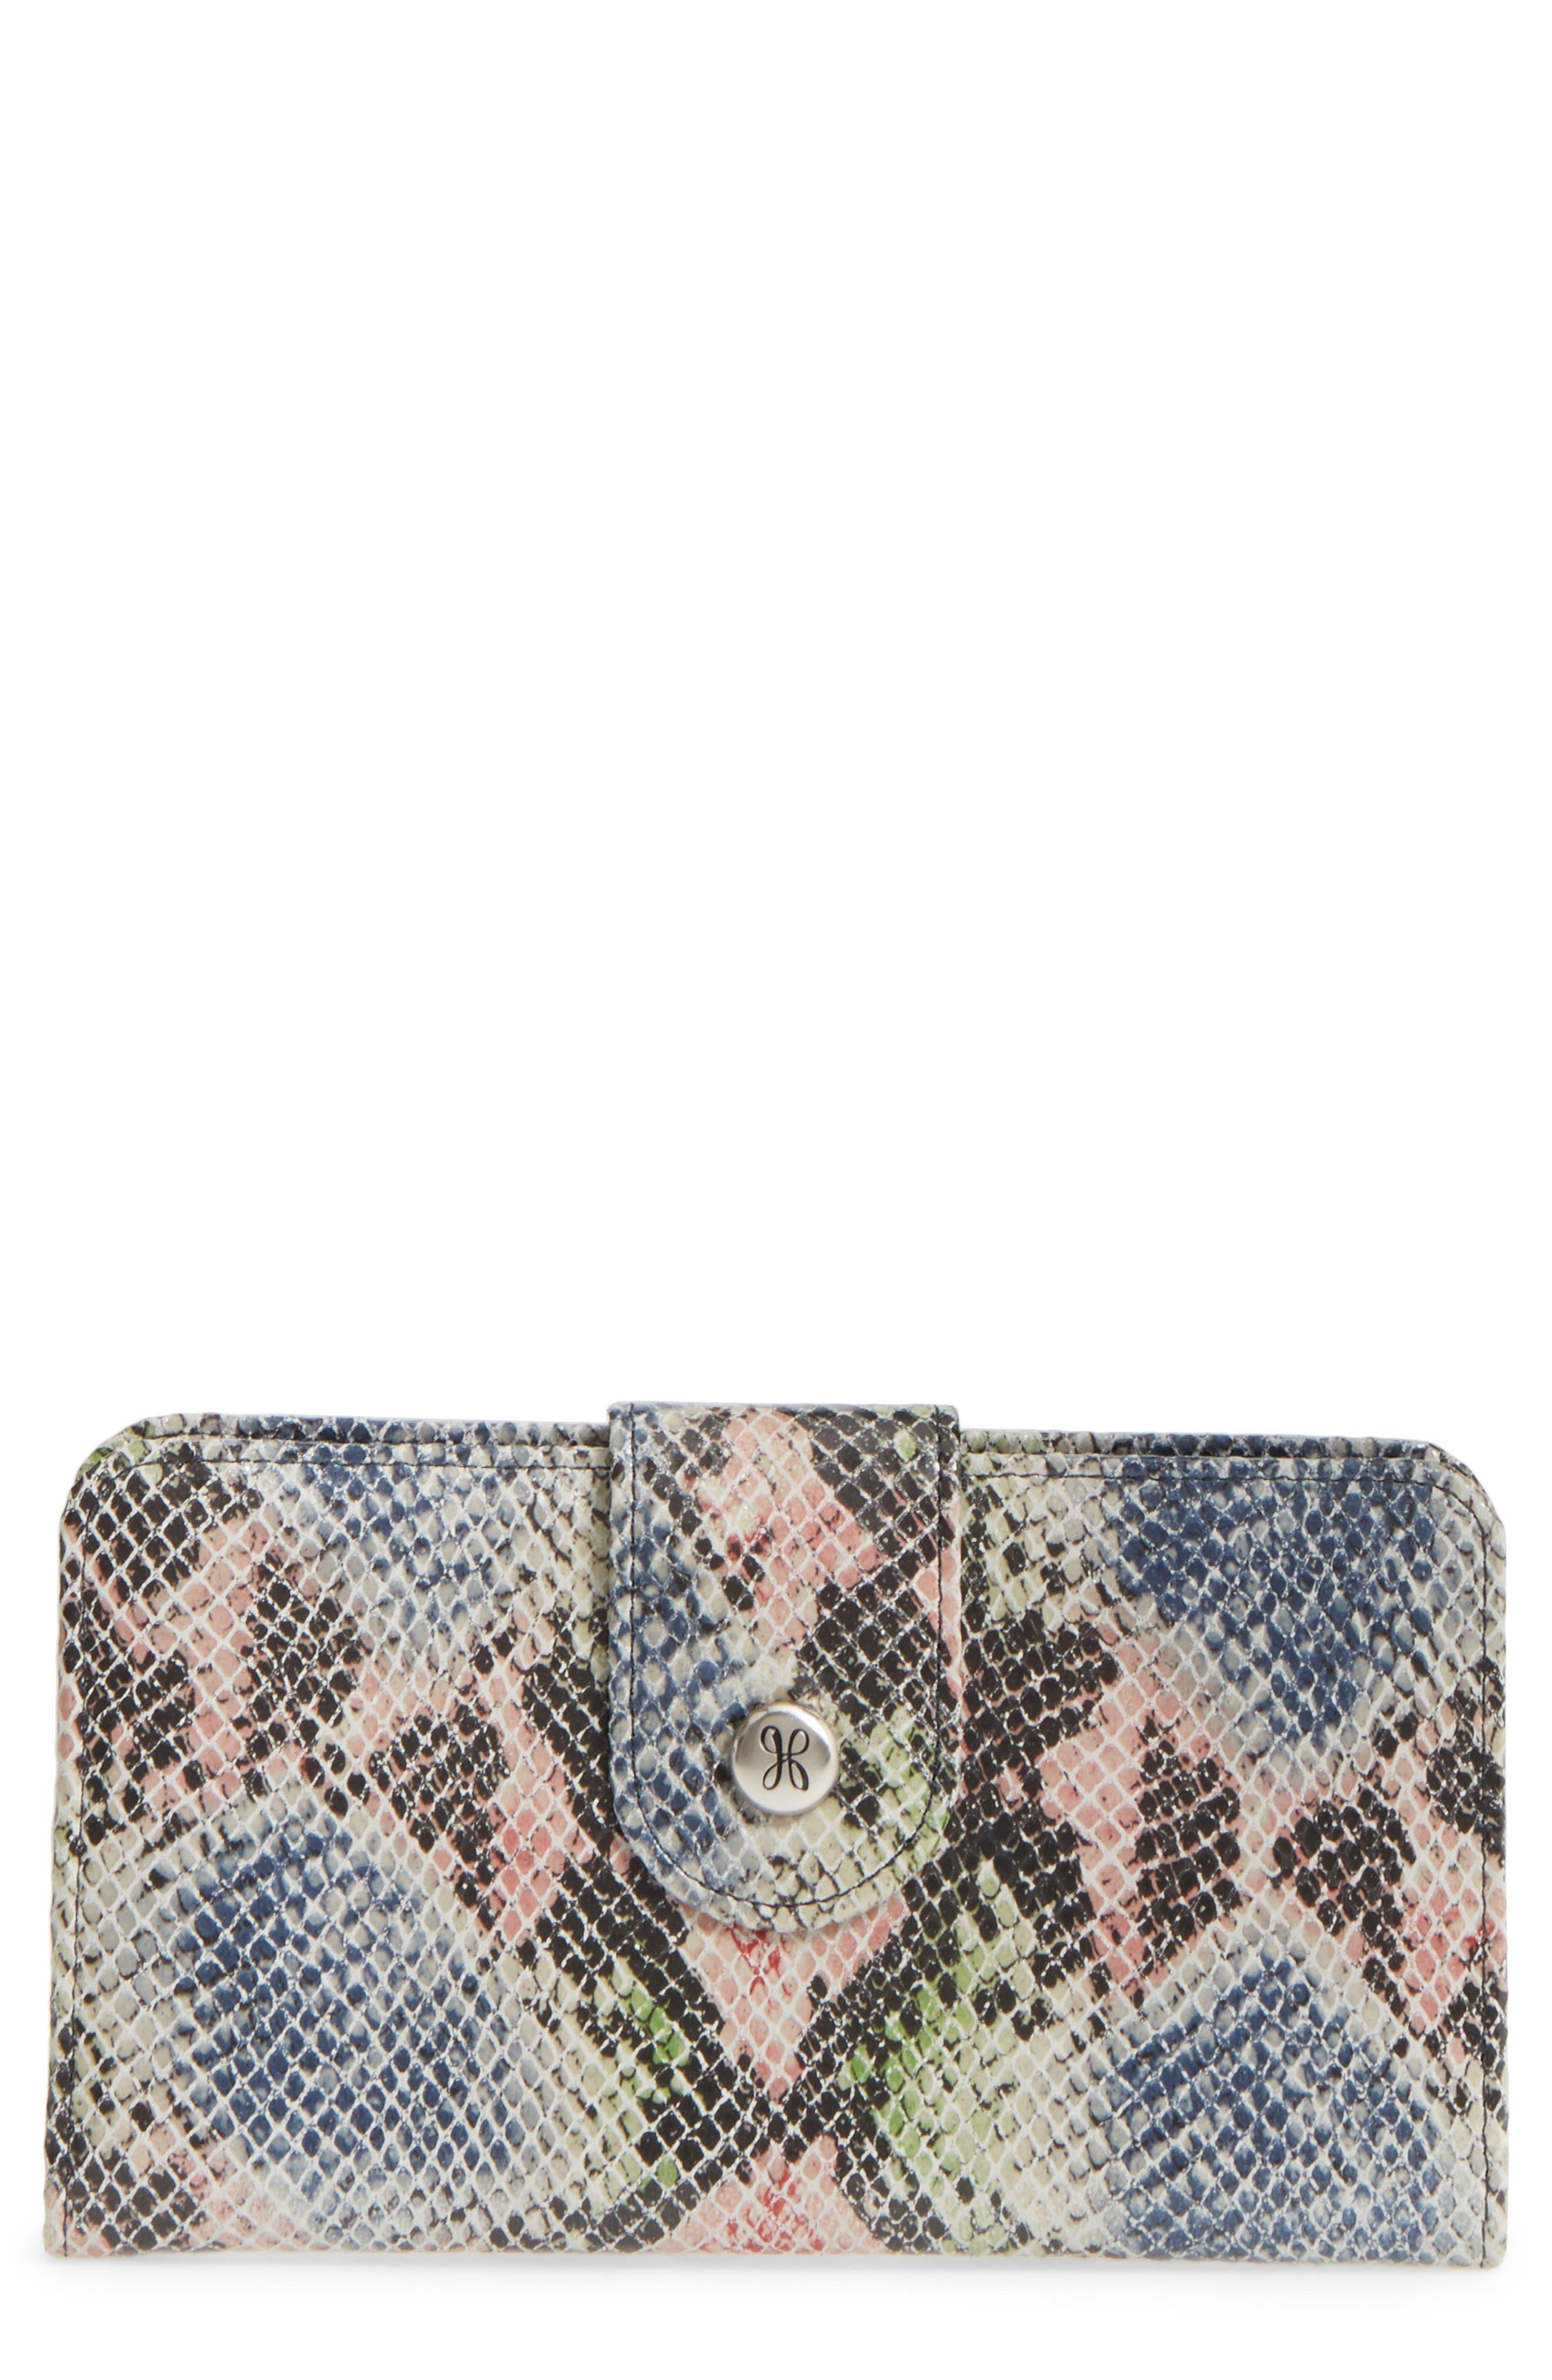 Alternate Image 1 Selected - Hobo 'Danette' Glazed Leather Continental Wallet